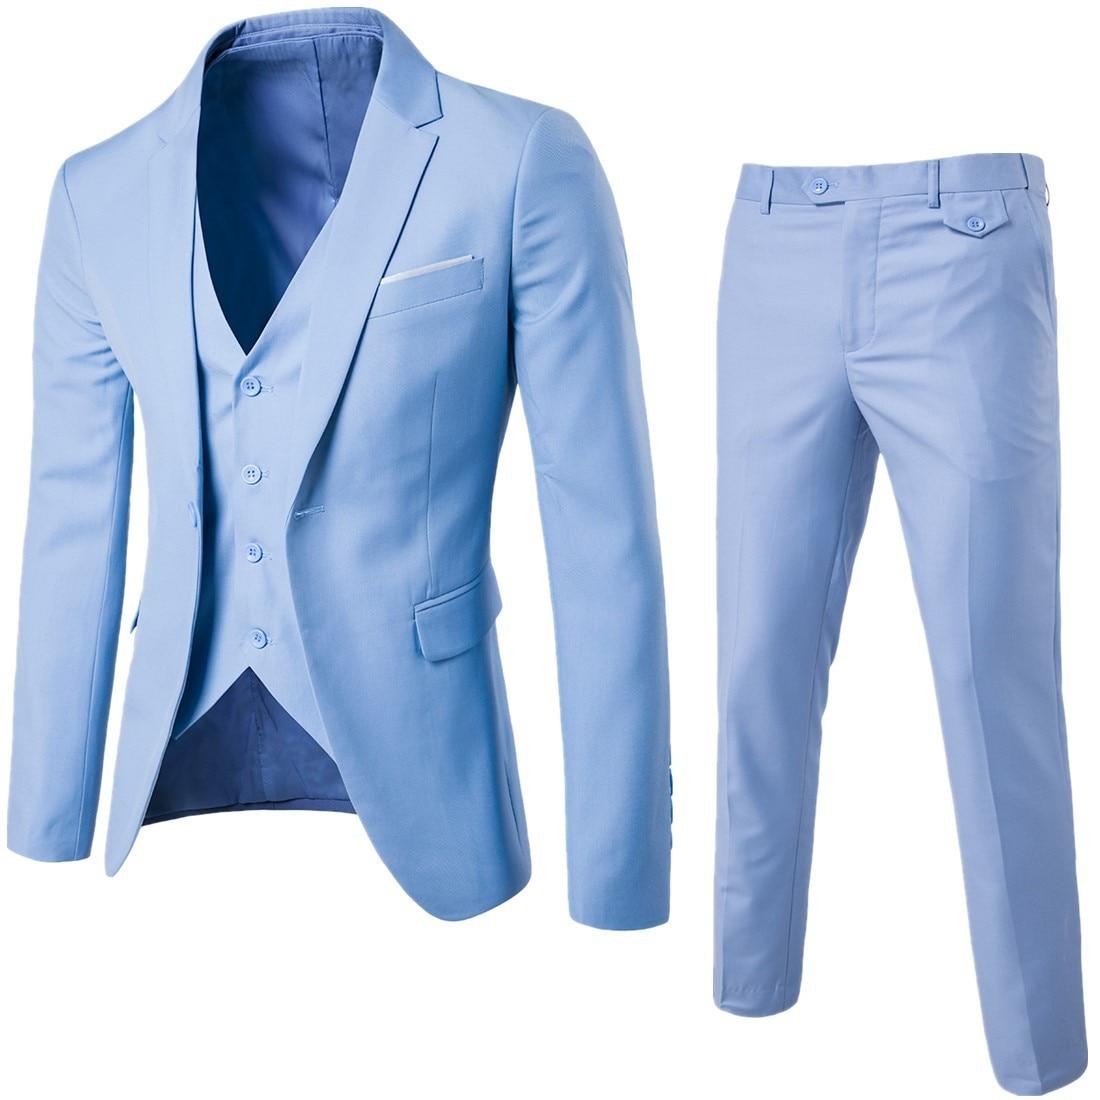 Suit Men Three-piece Set Business Formal Wear Business Suit Slim Fit Best Man Groom Marriage Formal Dress Spring